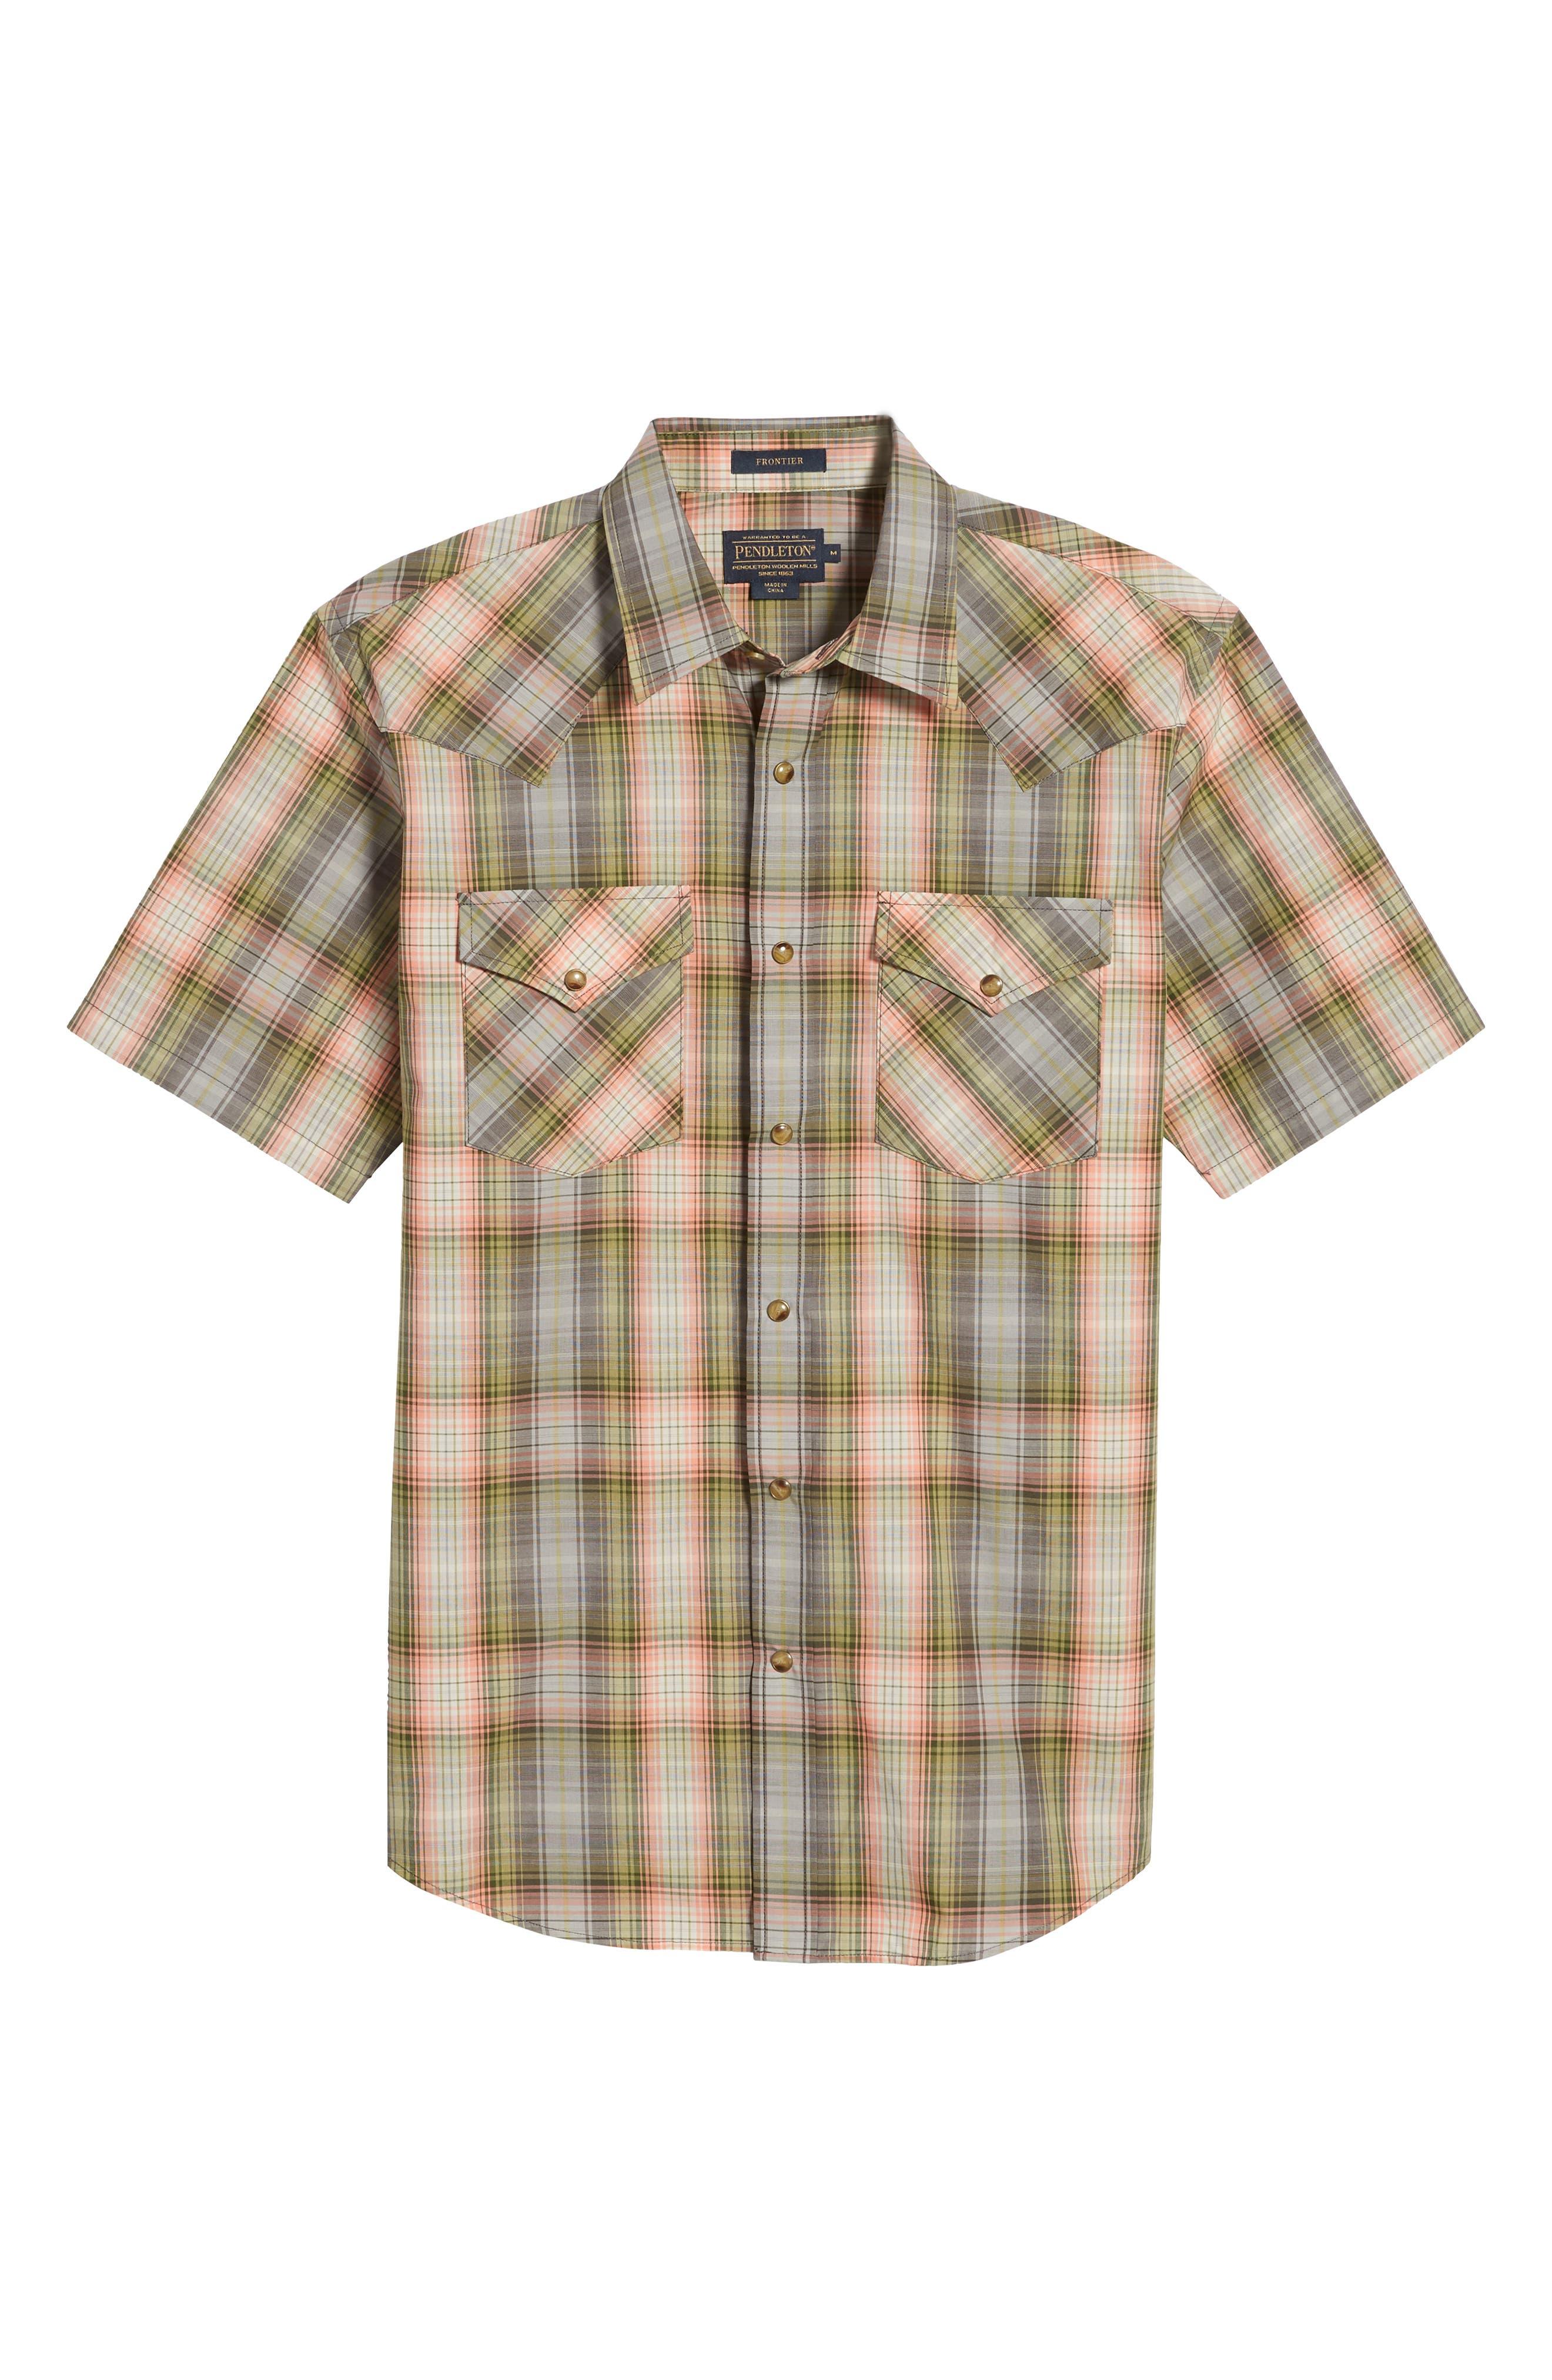 Frontier Regular Fit Plaid Short Sleeve Sport Shirt,                             Alternate thumbnail 11, color,